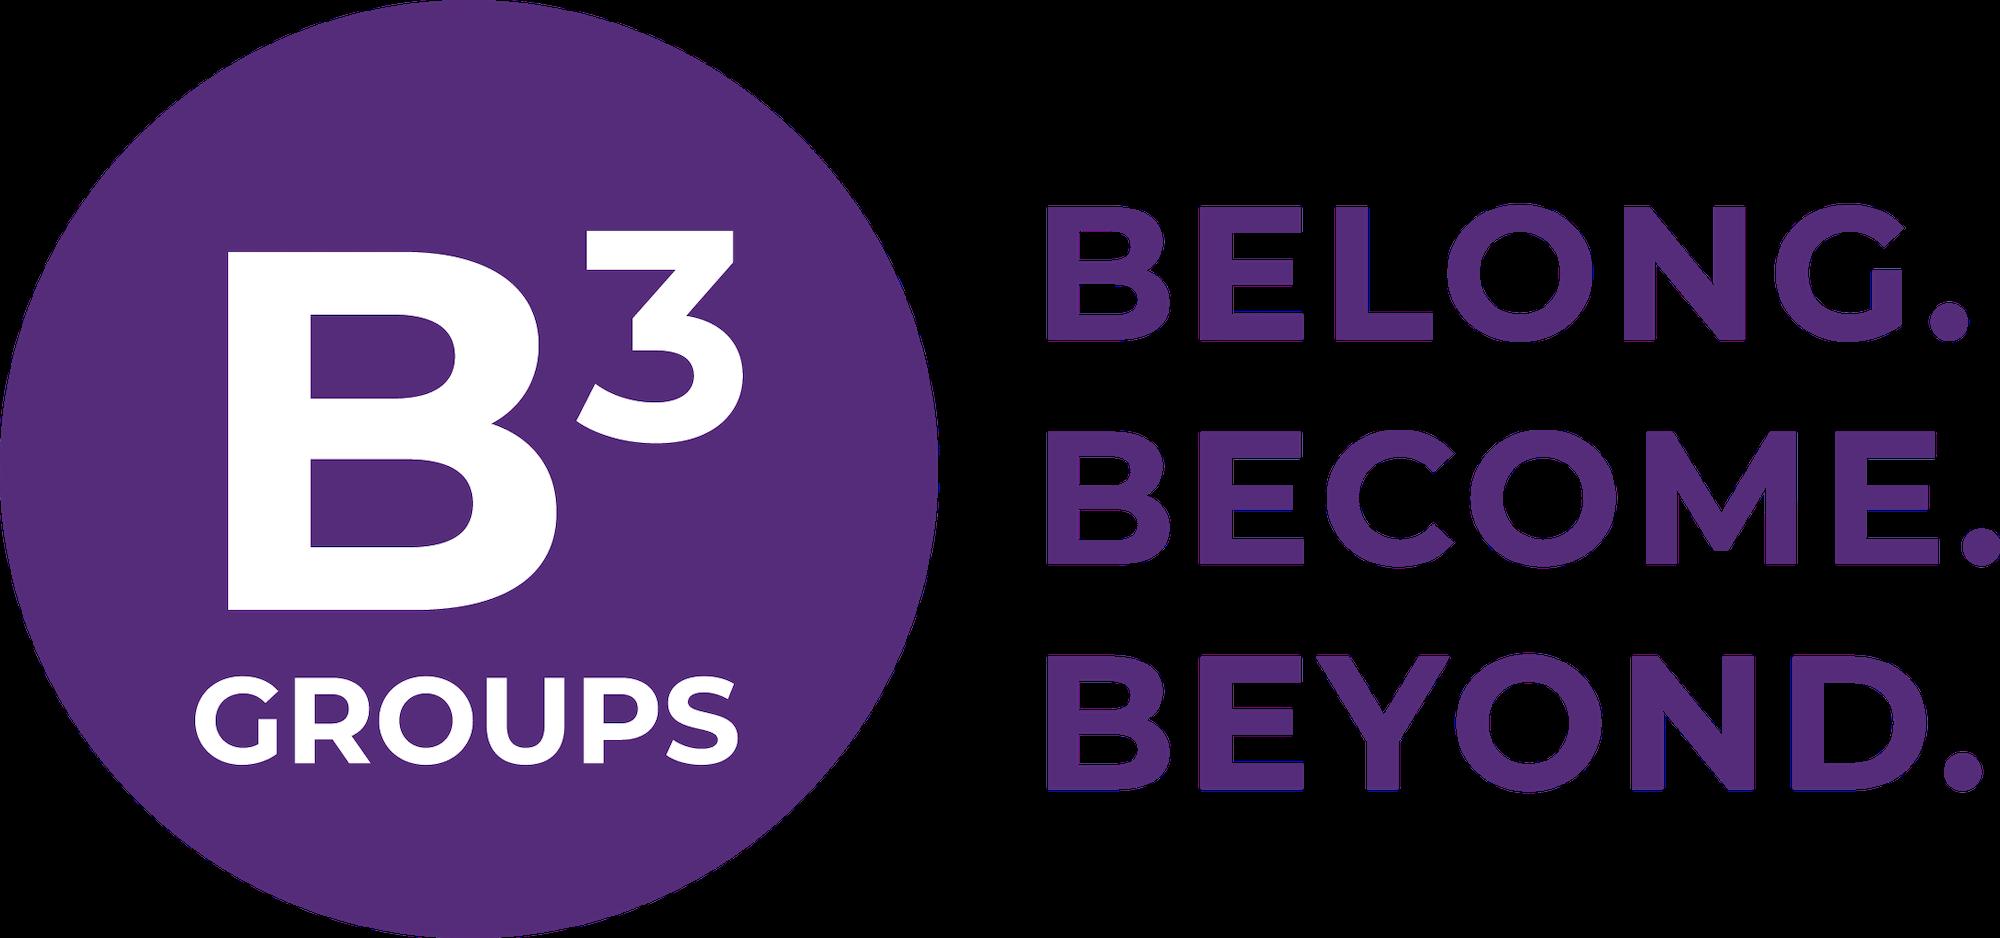 1 B3 Logo